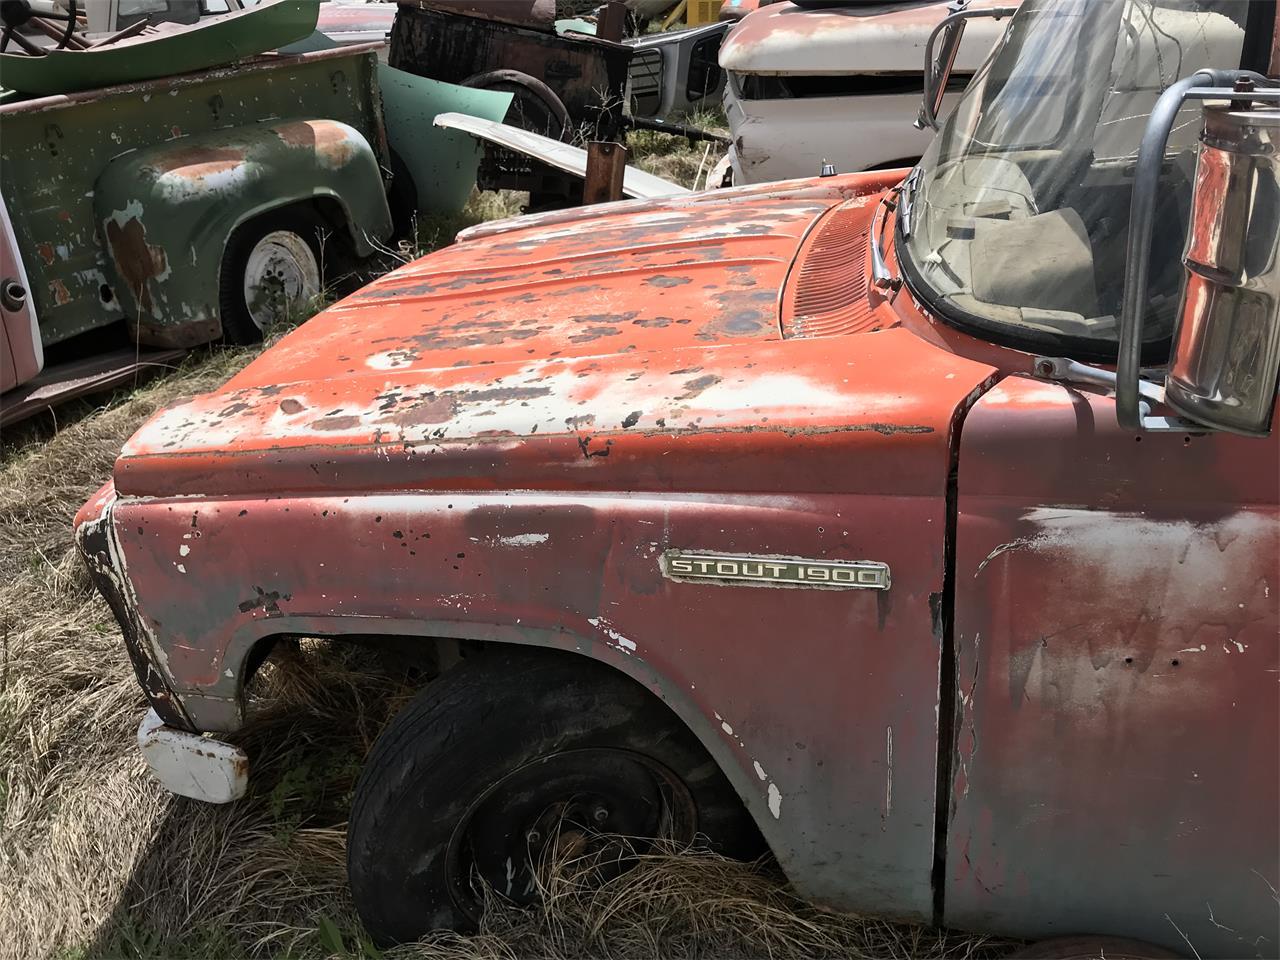 Toyota Dealers In Az >> 1960 Toyota Pickup for Sale | ClassicCars.com | CC-1110878